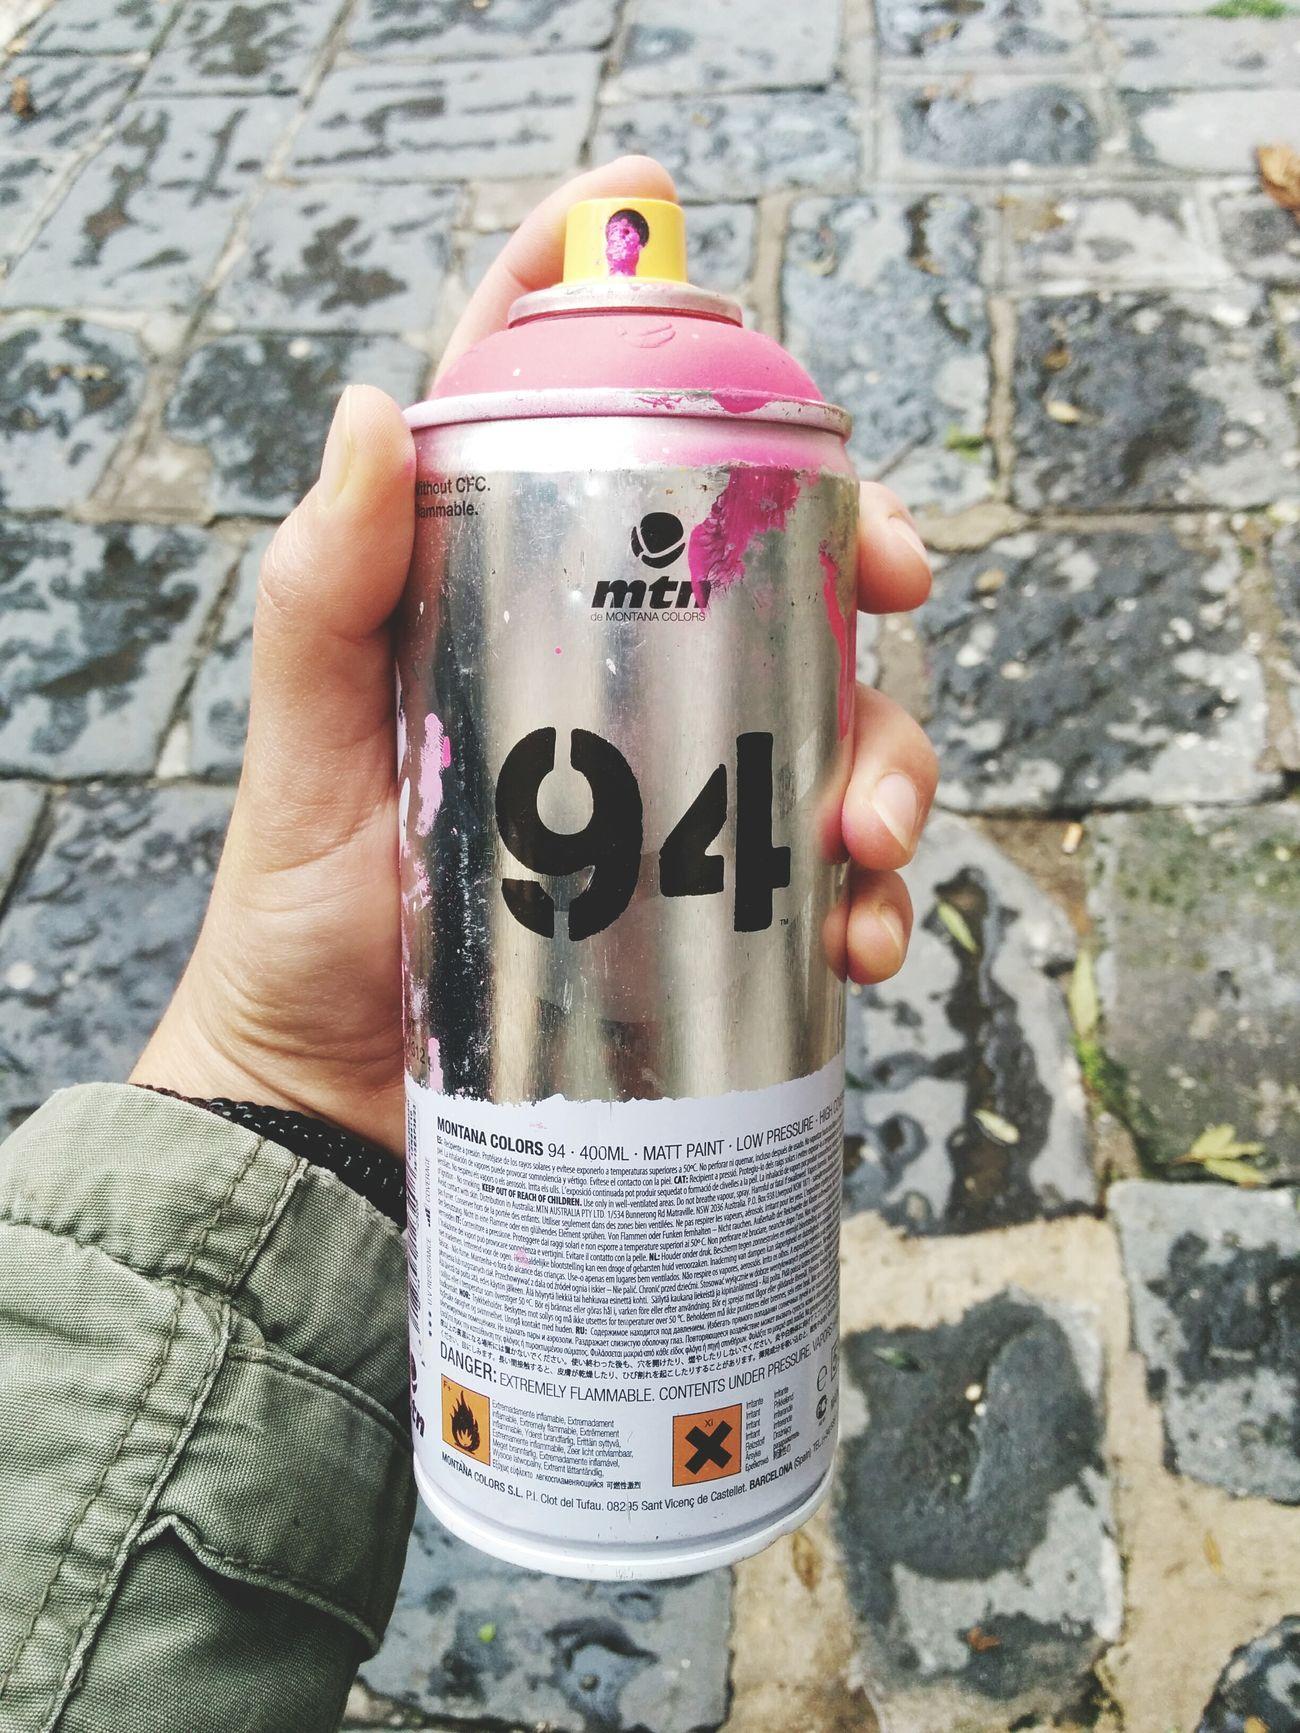 Streetartfestival Memorieurbane Spray Latas 94 Street Art Memorieurbane2015 Campaign2015 Workinginprogress Festival